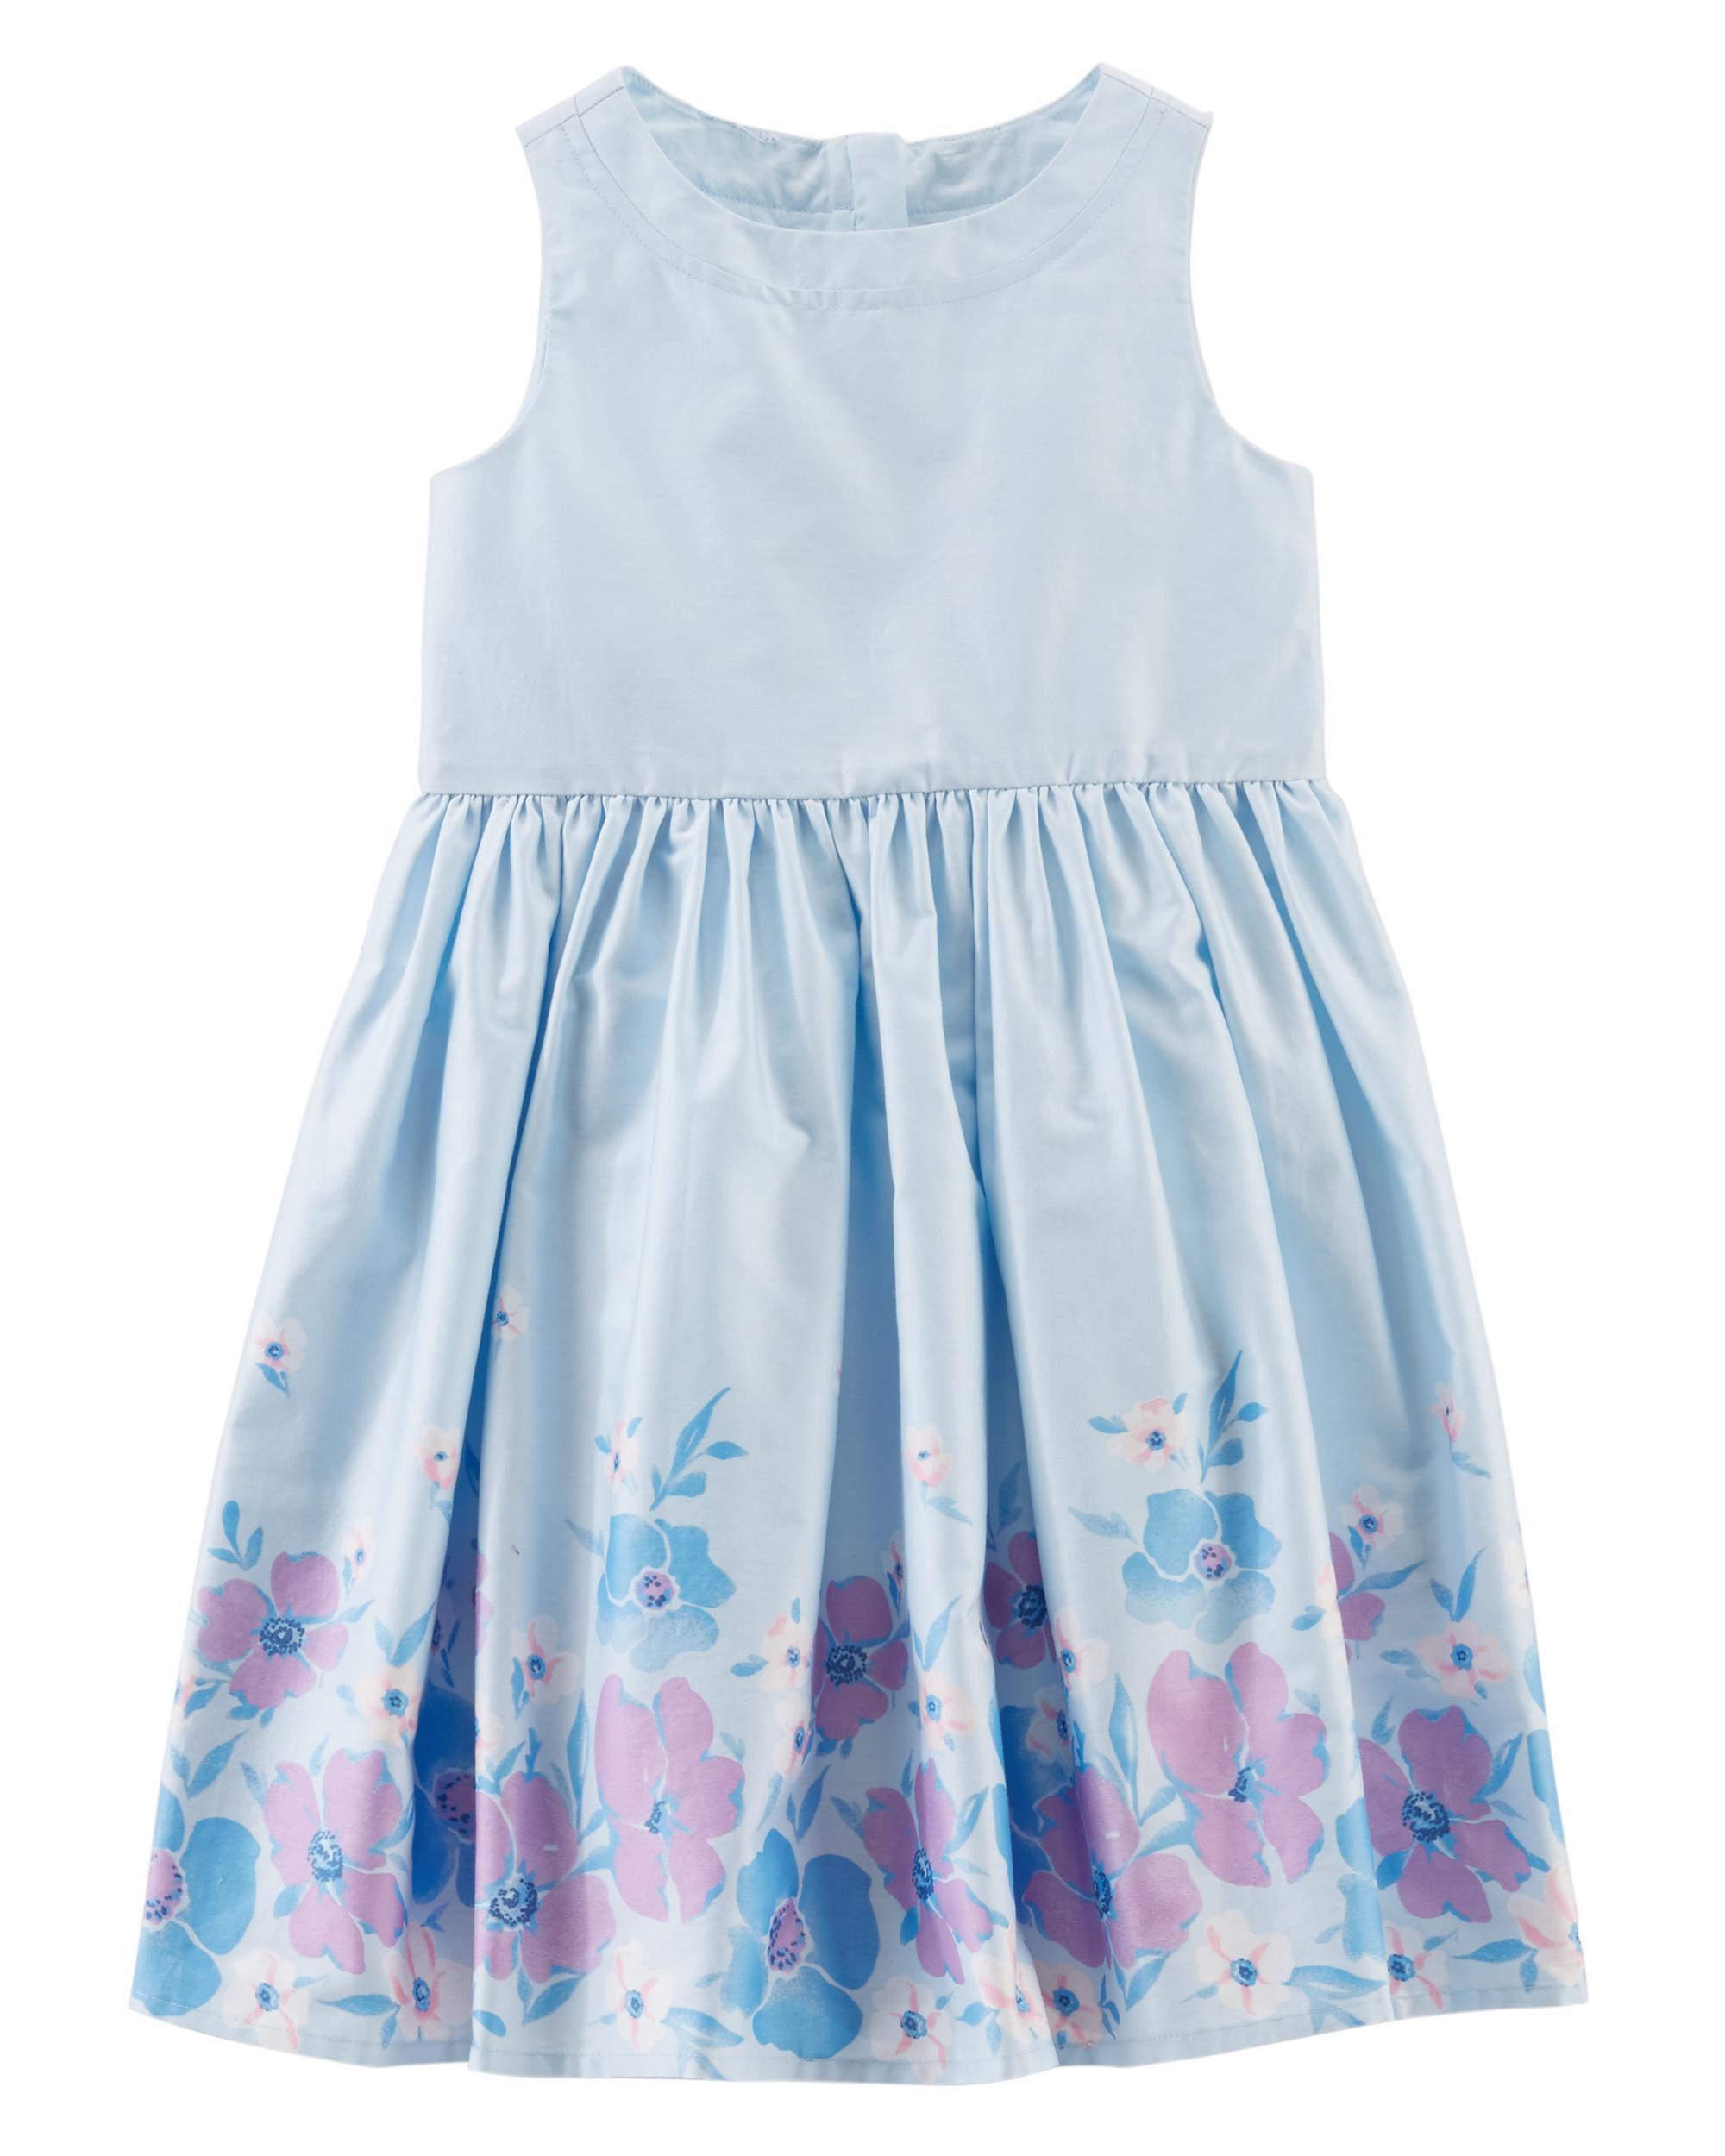 Girls Dresses Oshkosh Free Shipping